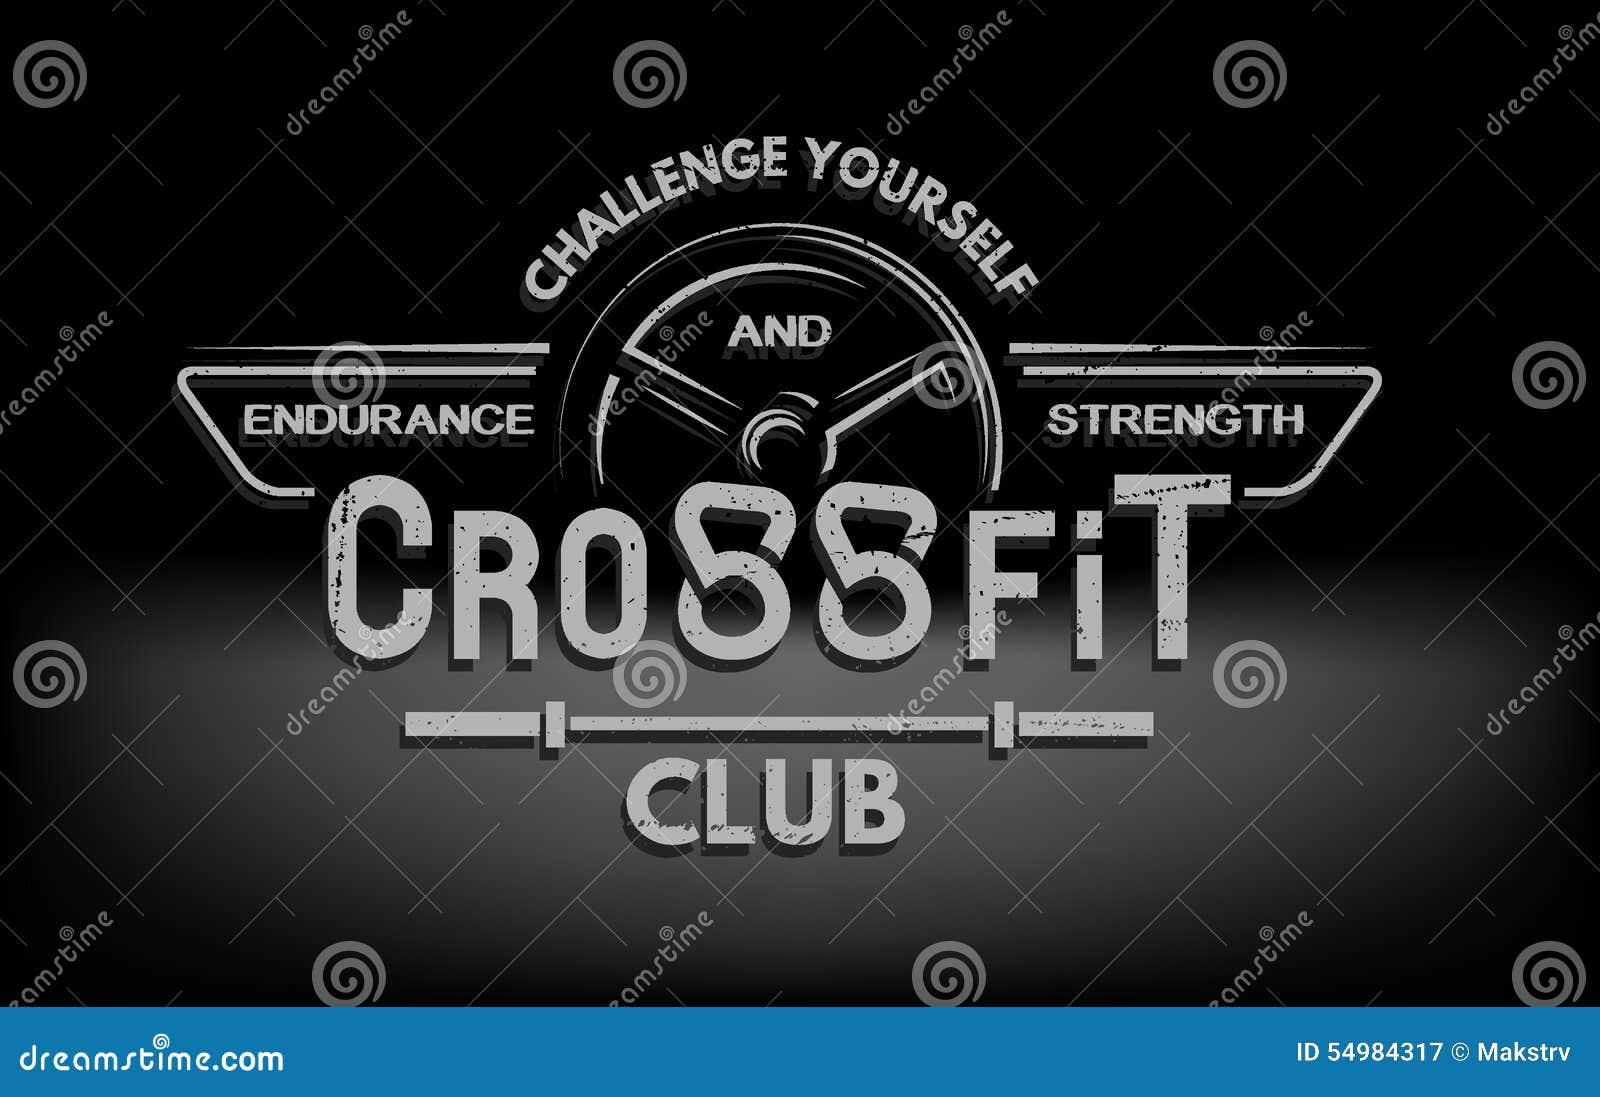 crossfit emblem with original lettering and motivating